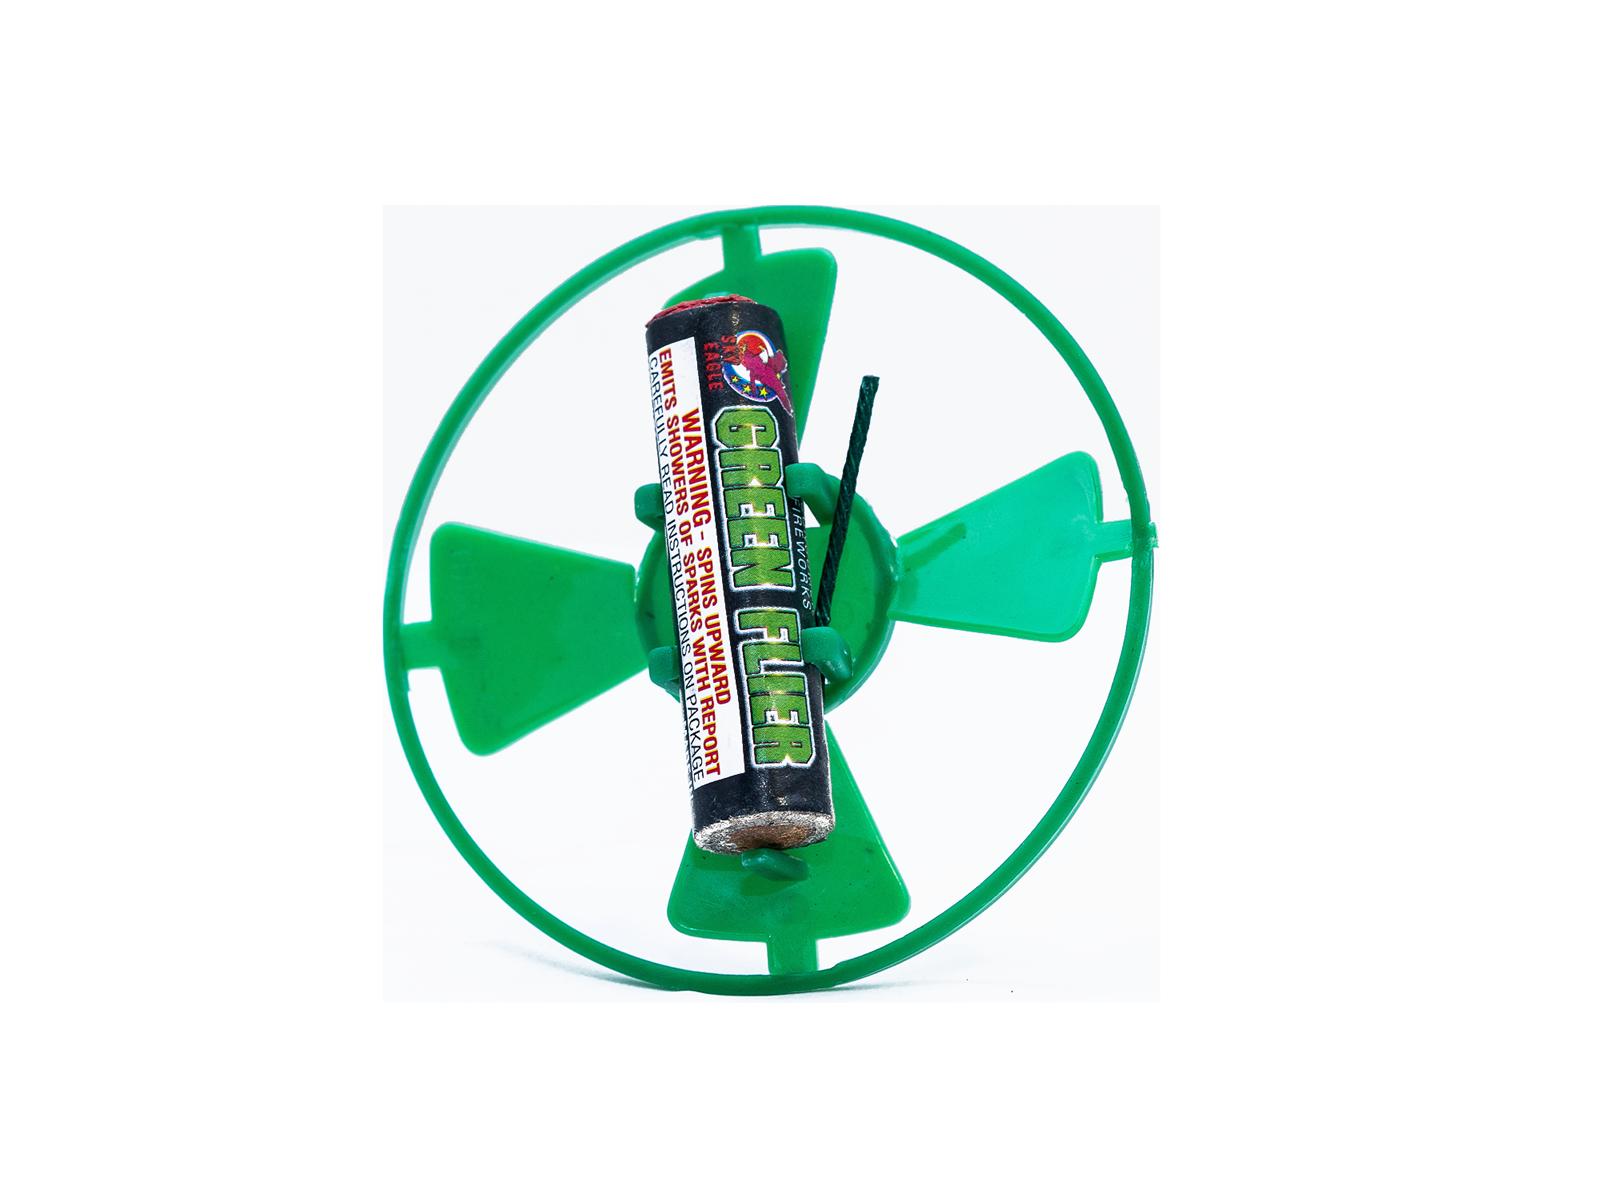 GR BLOOM FLIER / GREEN FLIER (Pack of 6)